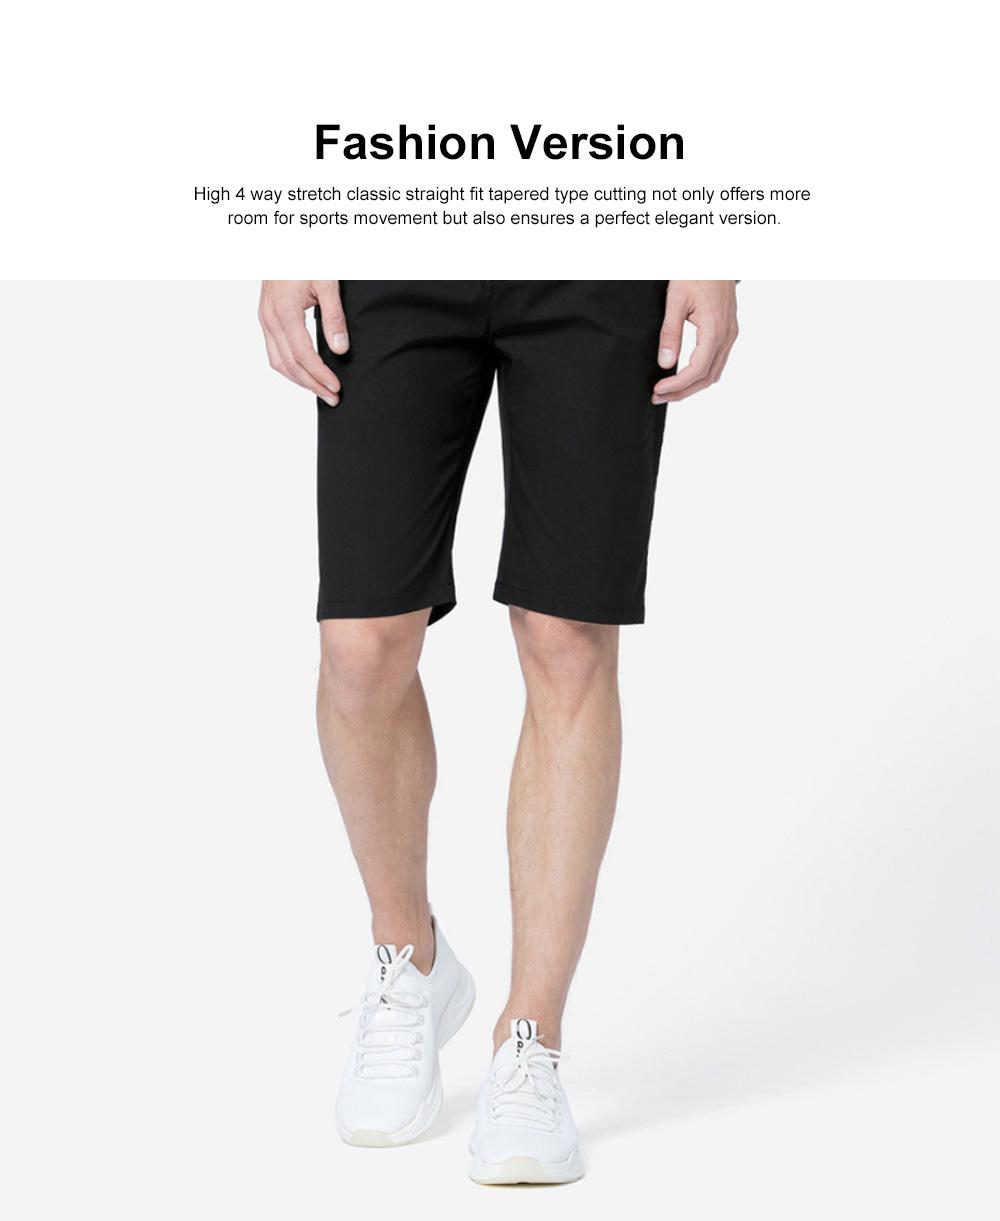 Mens Casual Classic Shorts, Fit Hybrid Chino Shorts, Drawstring Summer Beach Pants with 2 Pockets 1